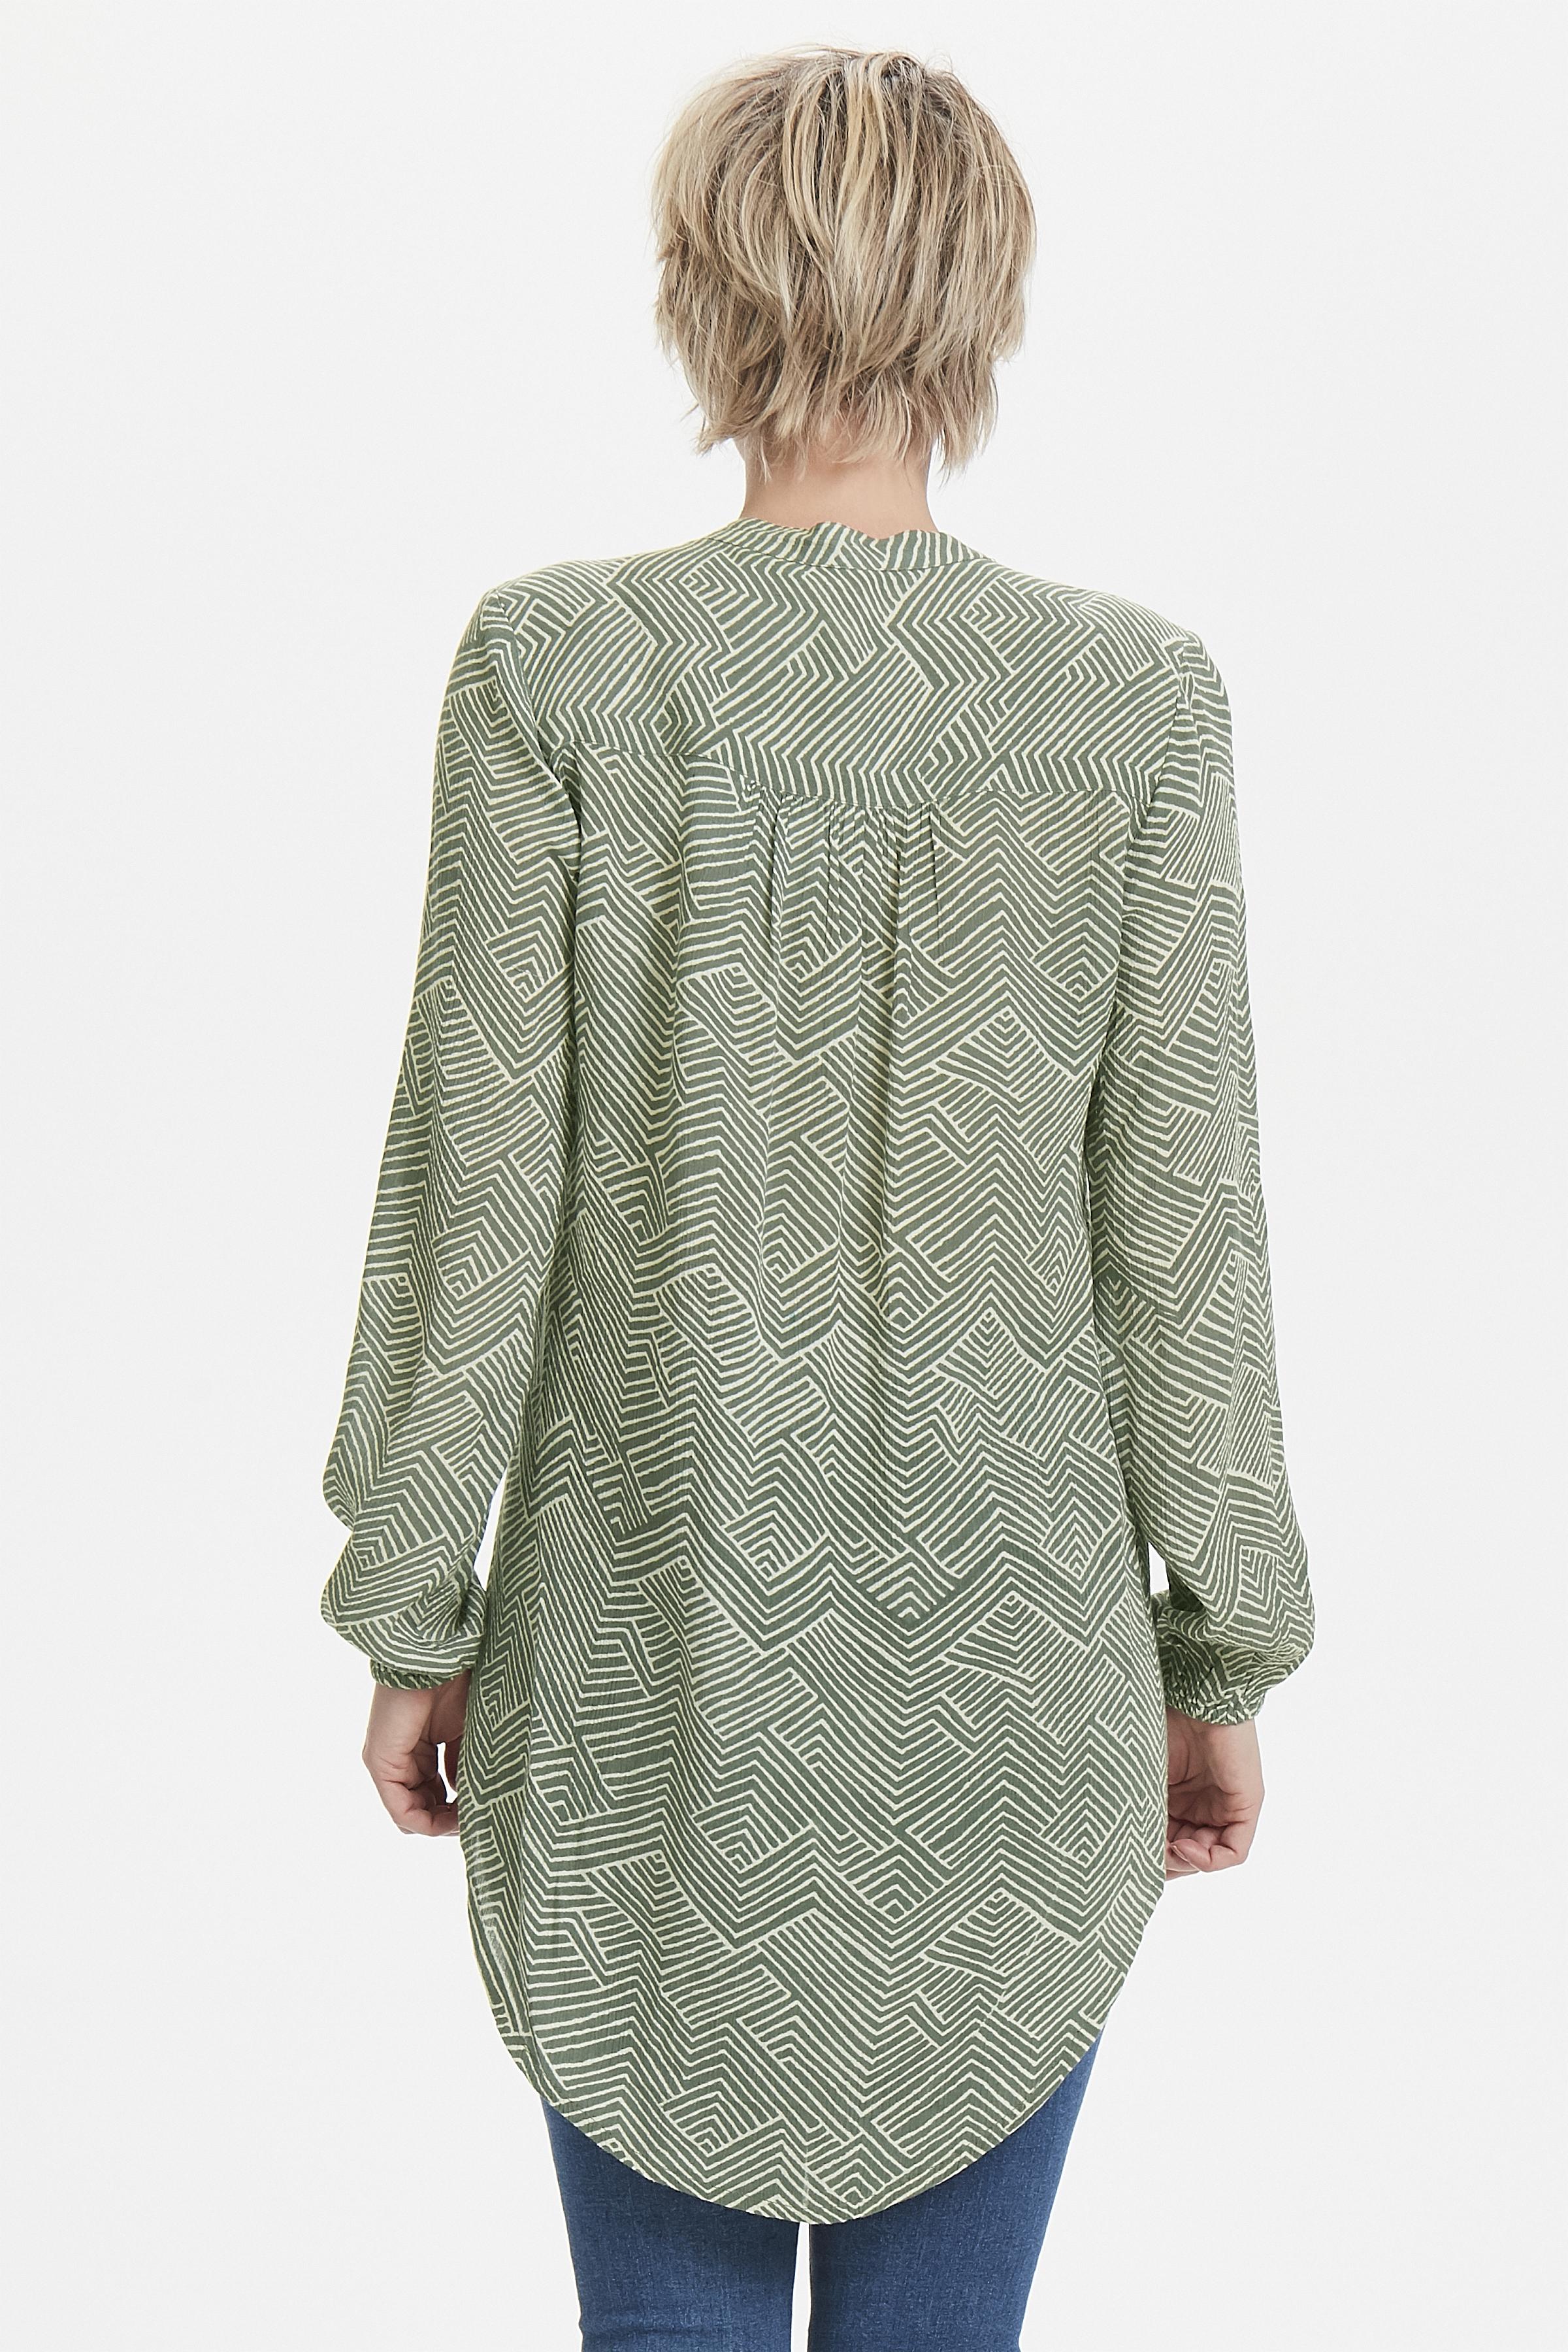 Grün/creme Tunika von Bon'A Parte – Shoppen Sie Grün/creme Tunika ab Gr. S-2XL hier